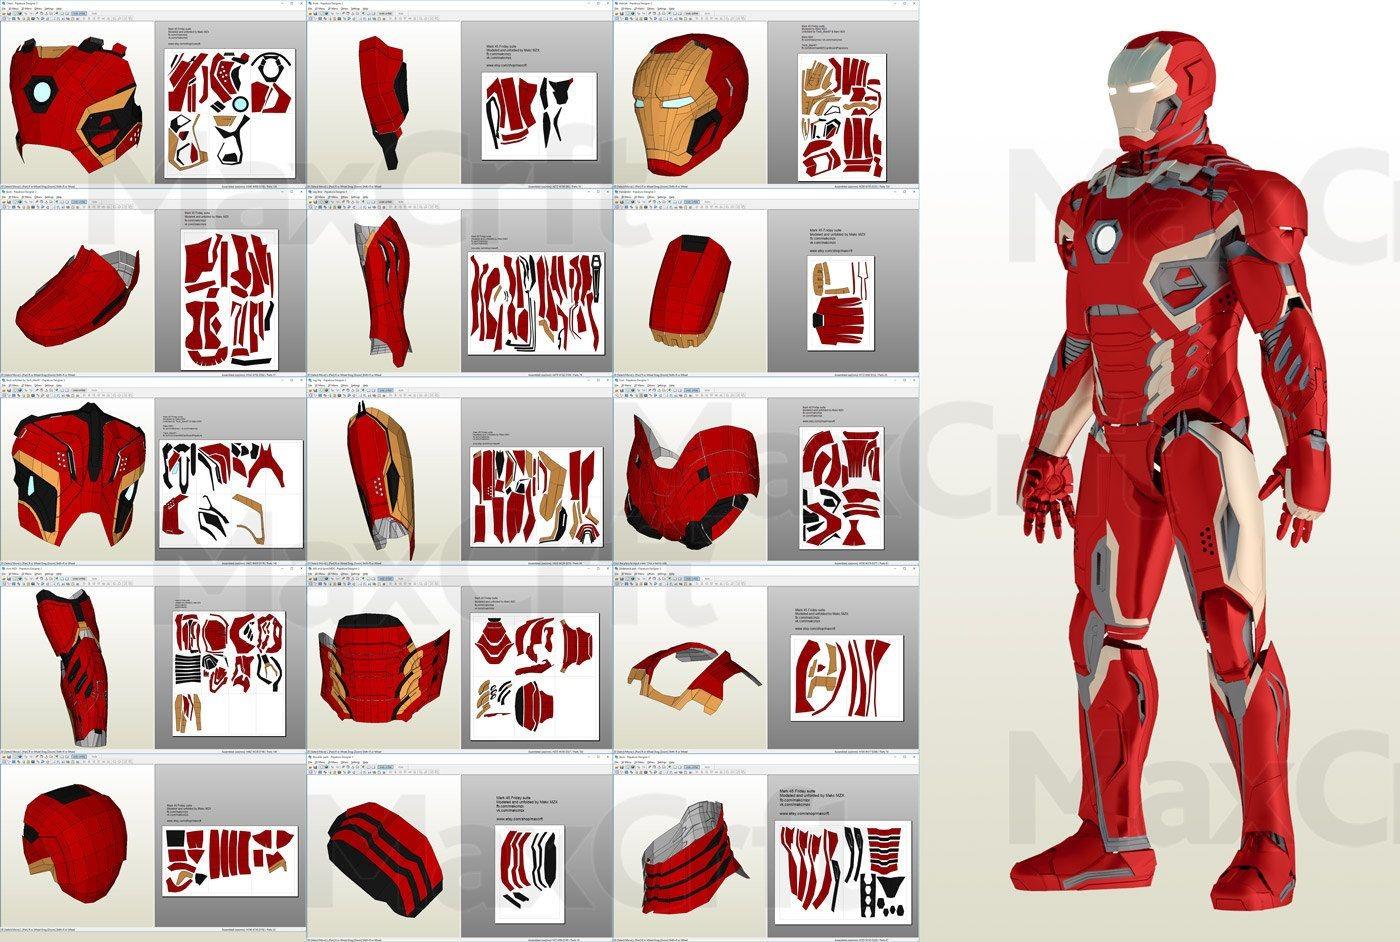 Iron Man Mask Papercraft Mark 45 Friday Helmet Pepakura File Diy Sukhragchaa